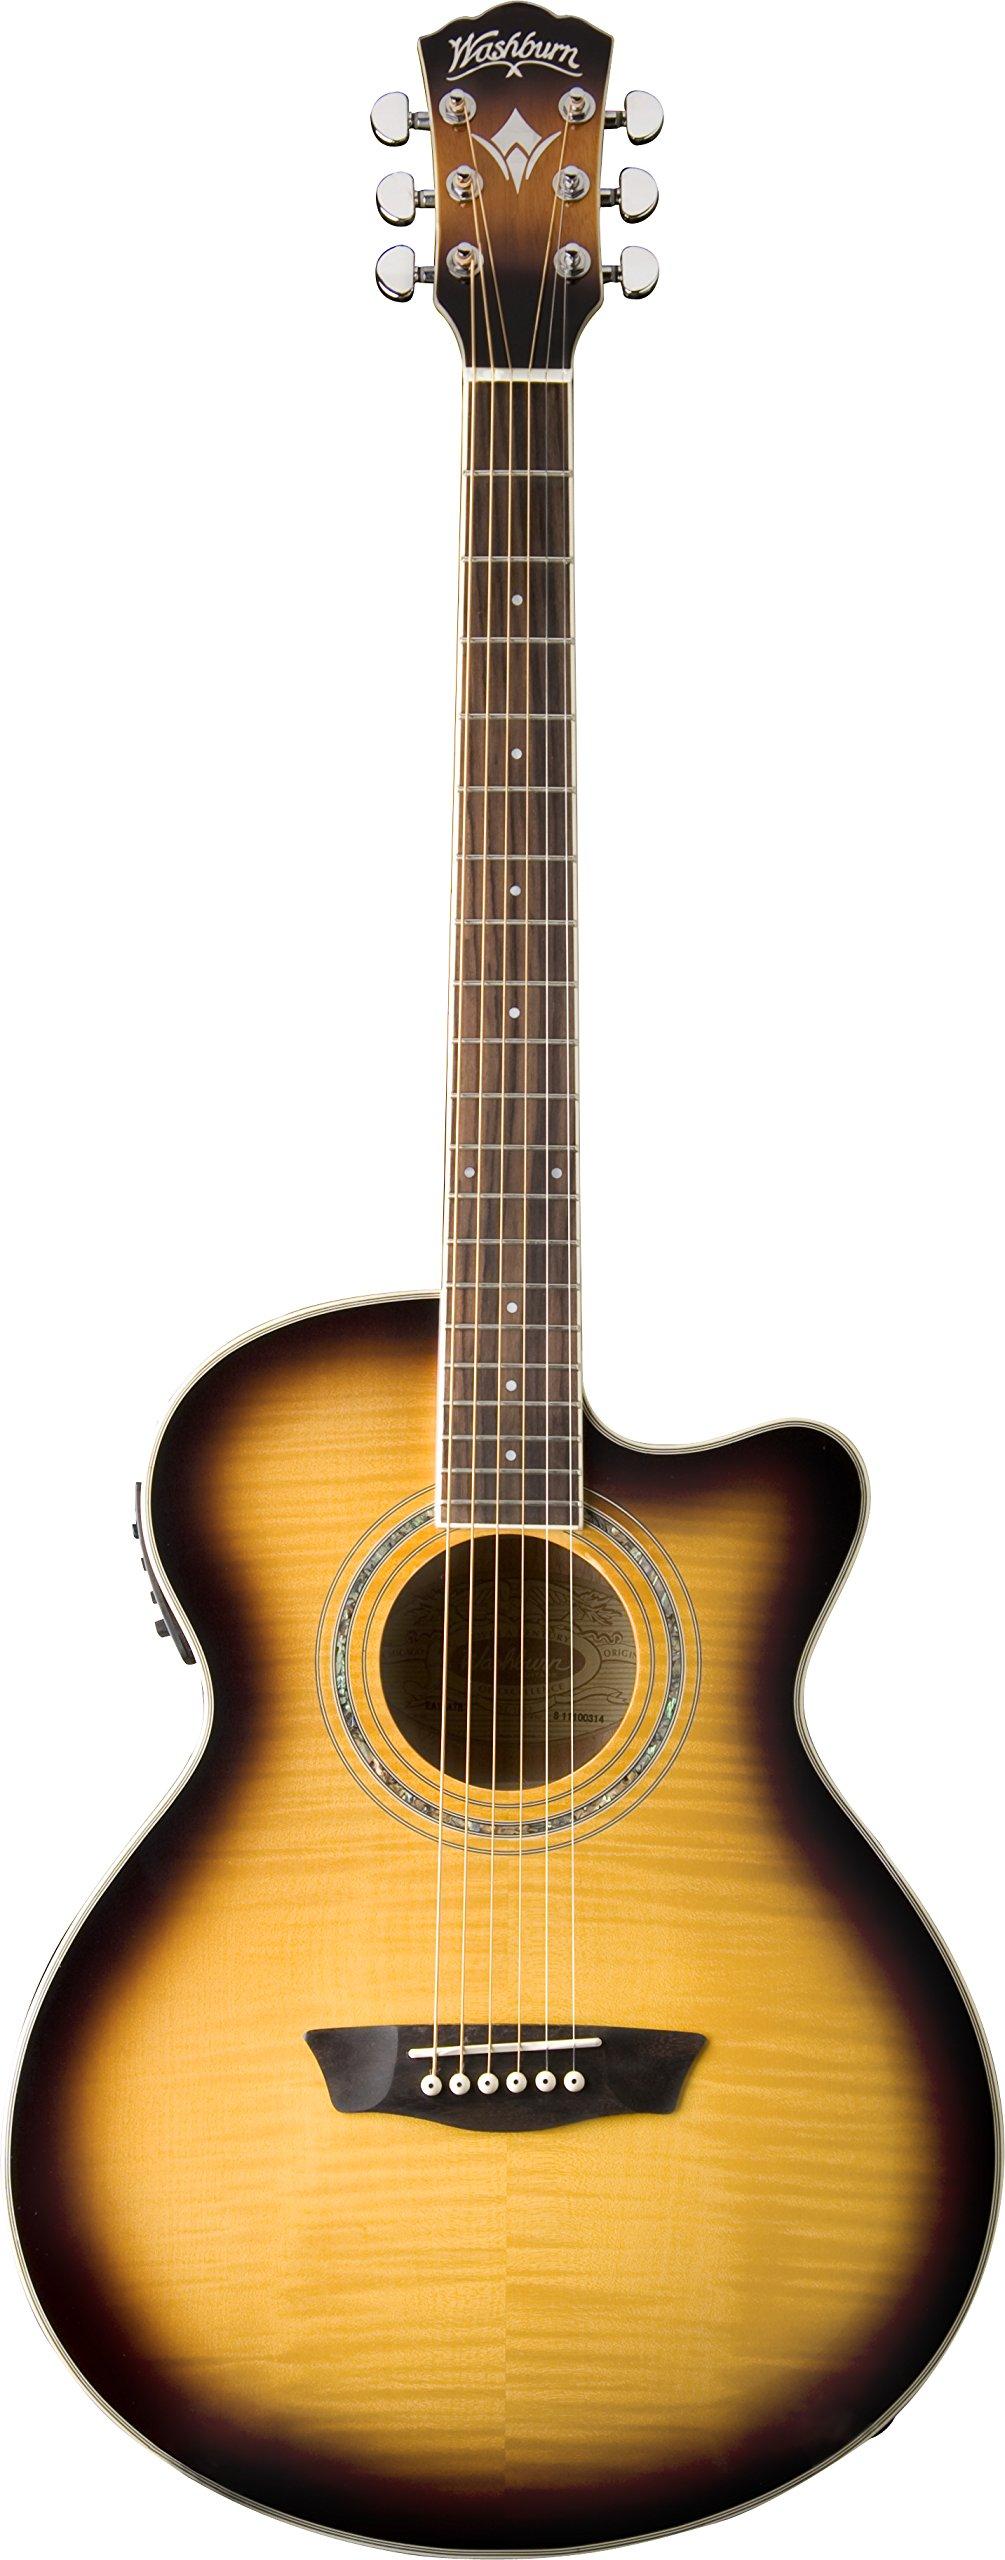 Washburn Festival Series EA15ATB Acoustic Guitar by Washburn